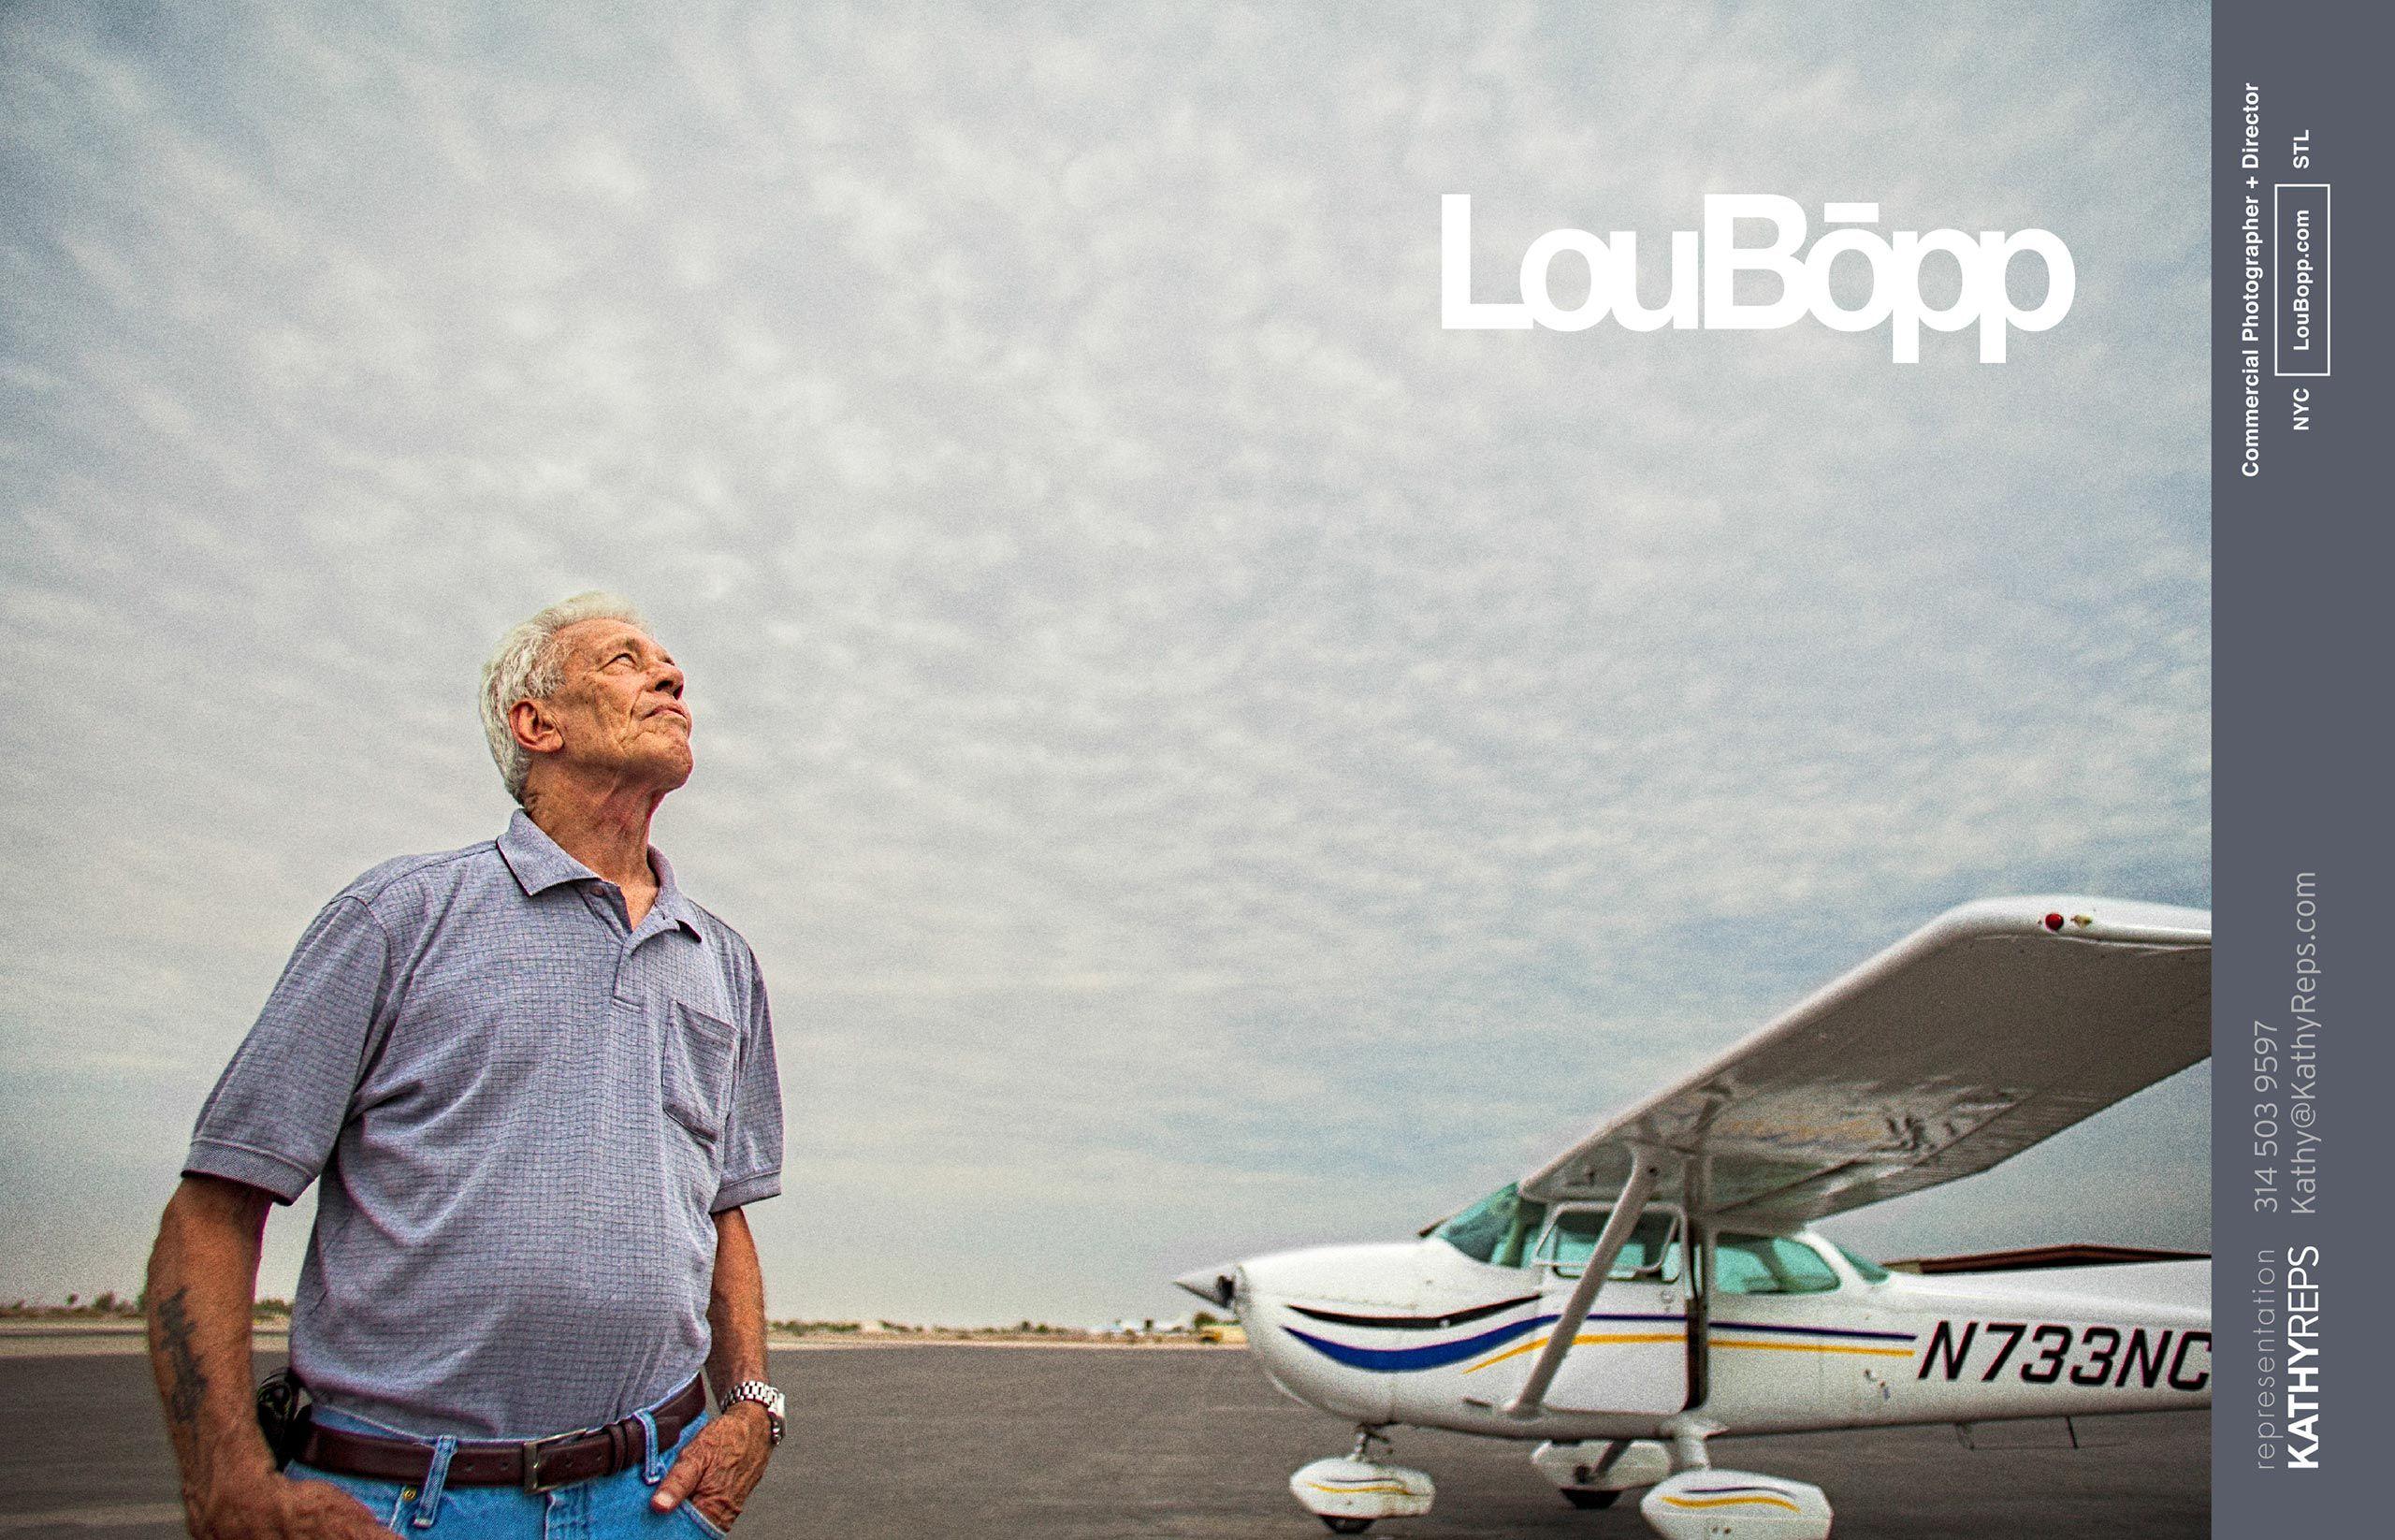 Lou-Bopp-Spring-2019-WorkbookPS.jpg